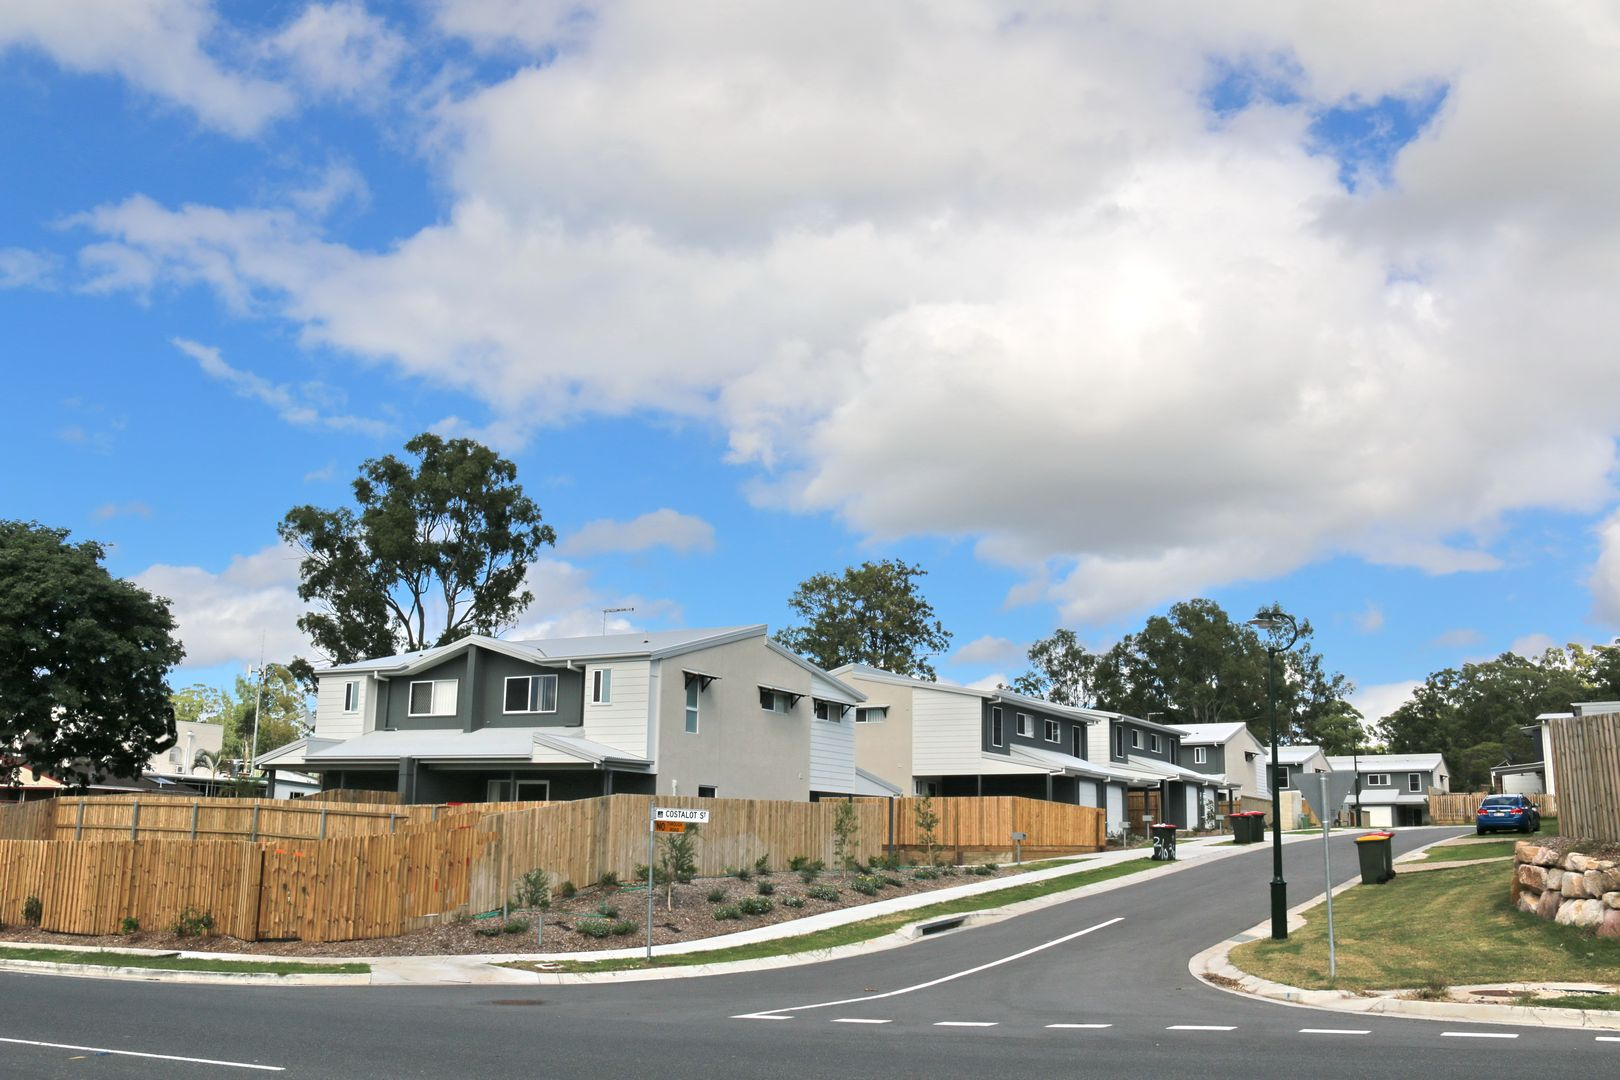 8/10 costalot street, Oxley QLD 4075, Image 0